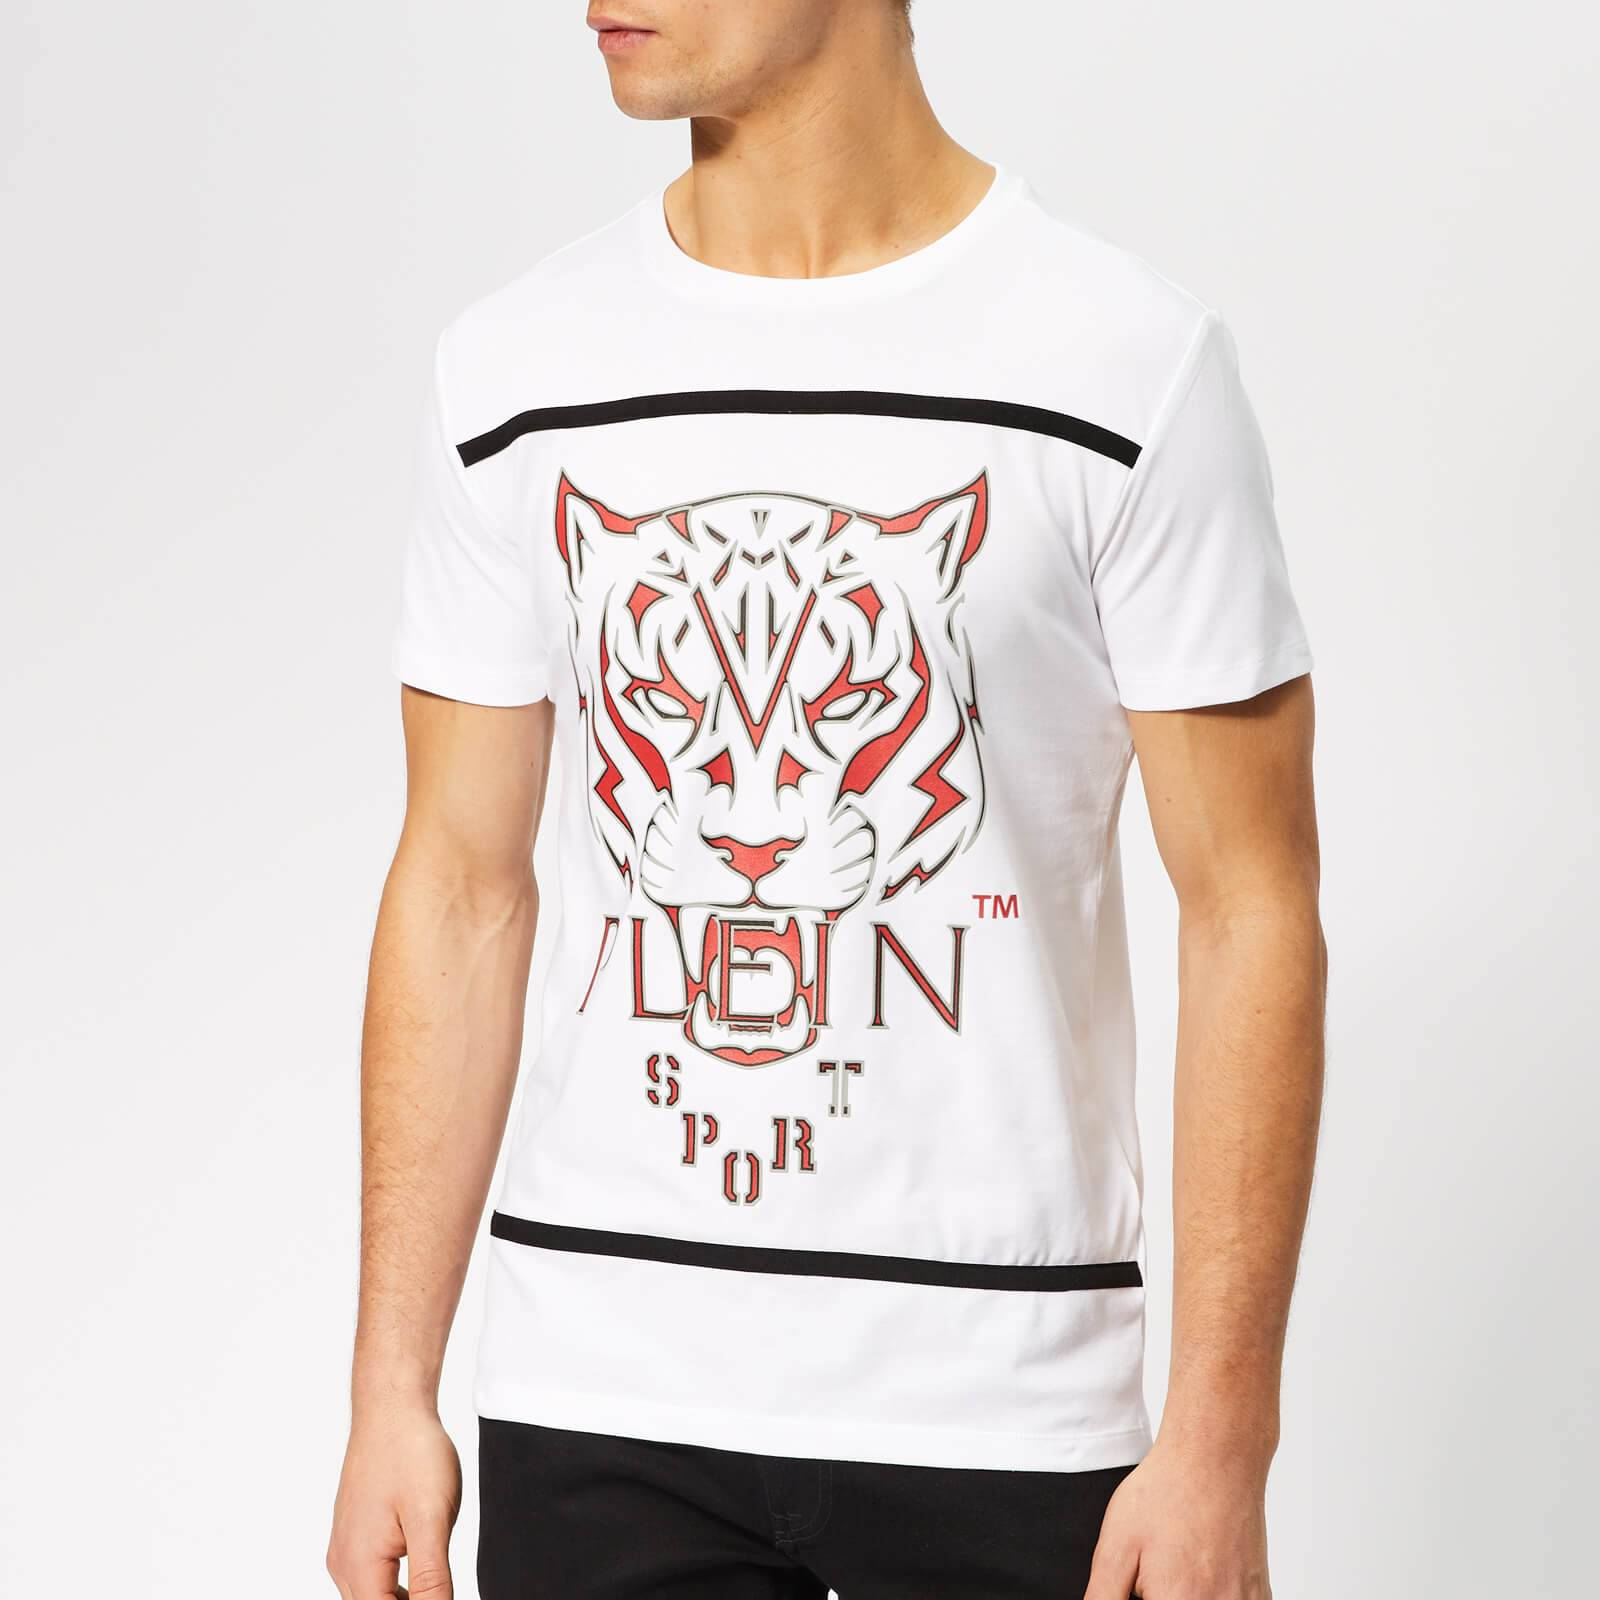 Plein Sport Men's Round Neck Tiger T-Shirt - White/Grey - XL - White/Grey